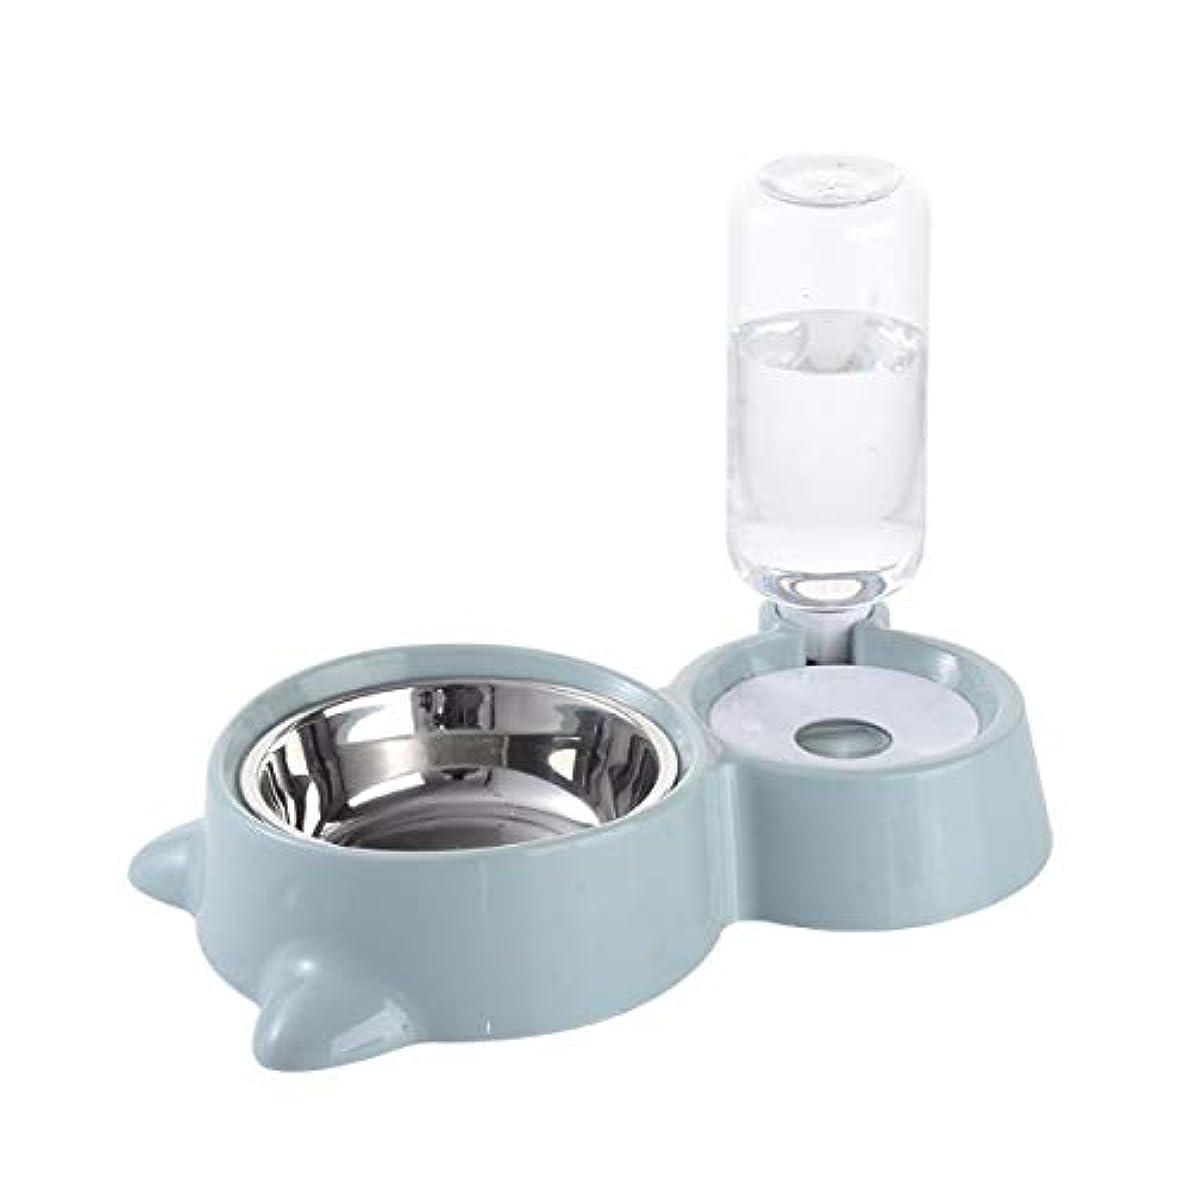 Xian ステンレス製のドッグボウル、ダブルボウル、ピンク、薄灰色、スカイブルー、3色 Easy to Clean Non-Skid Bowls for Dogs (Color : Sky blue)